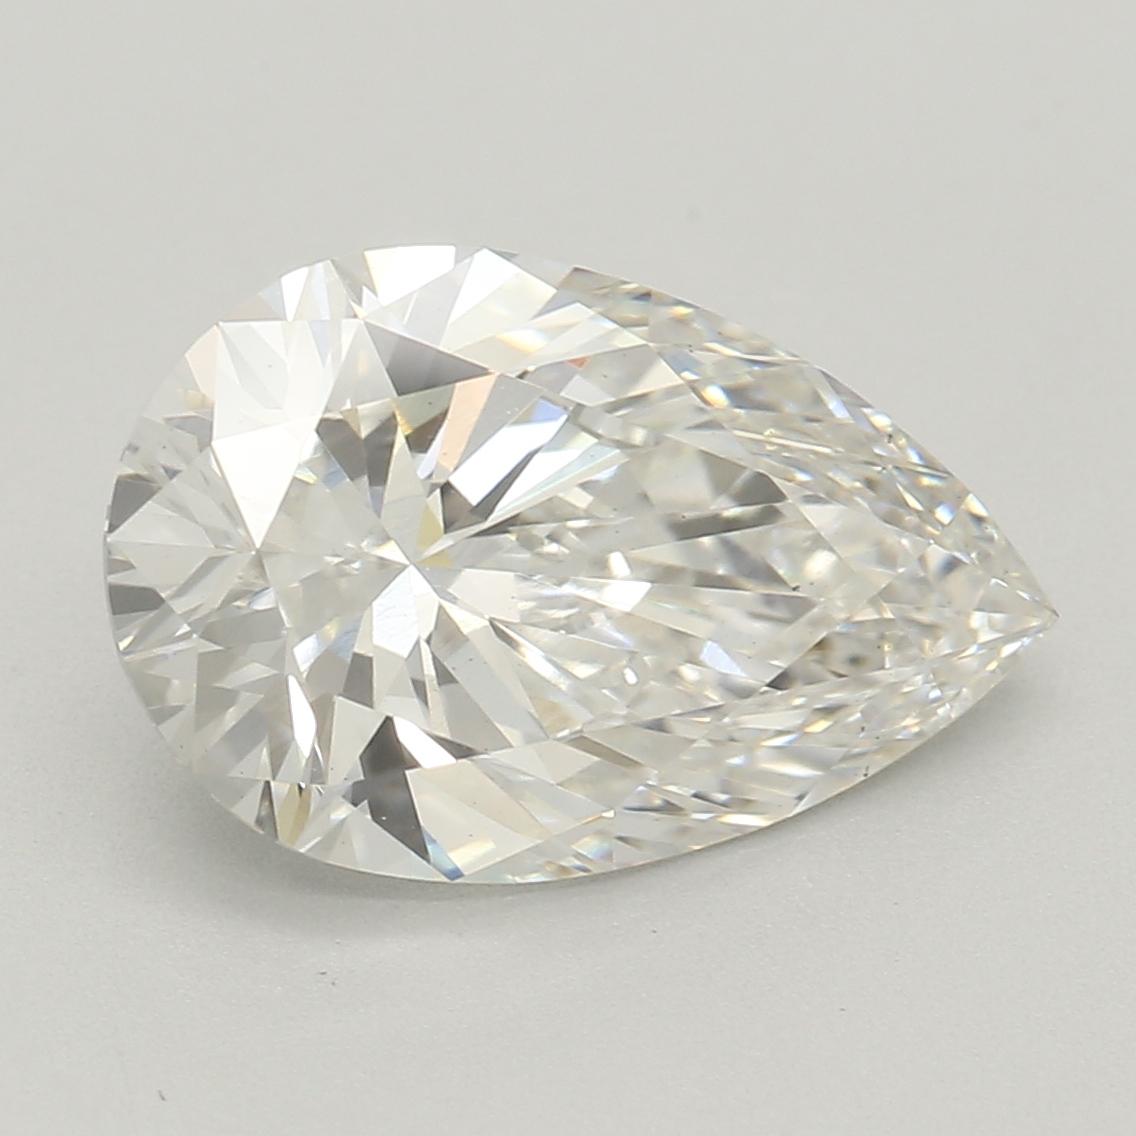 1.84-Carat Lab Created Ideally Cut Pear Diamond